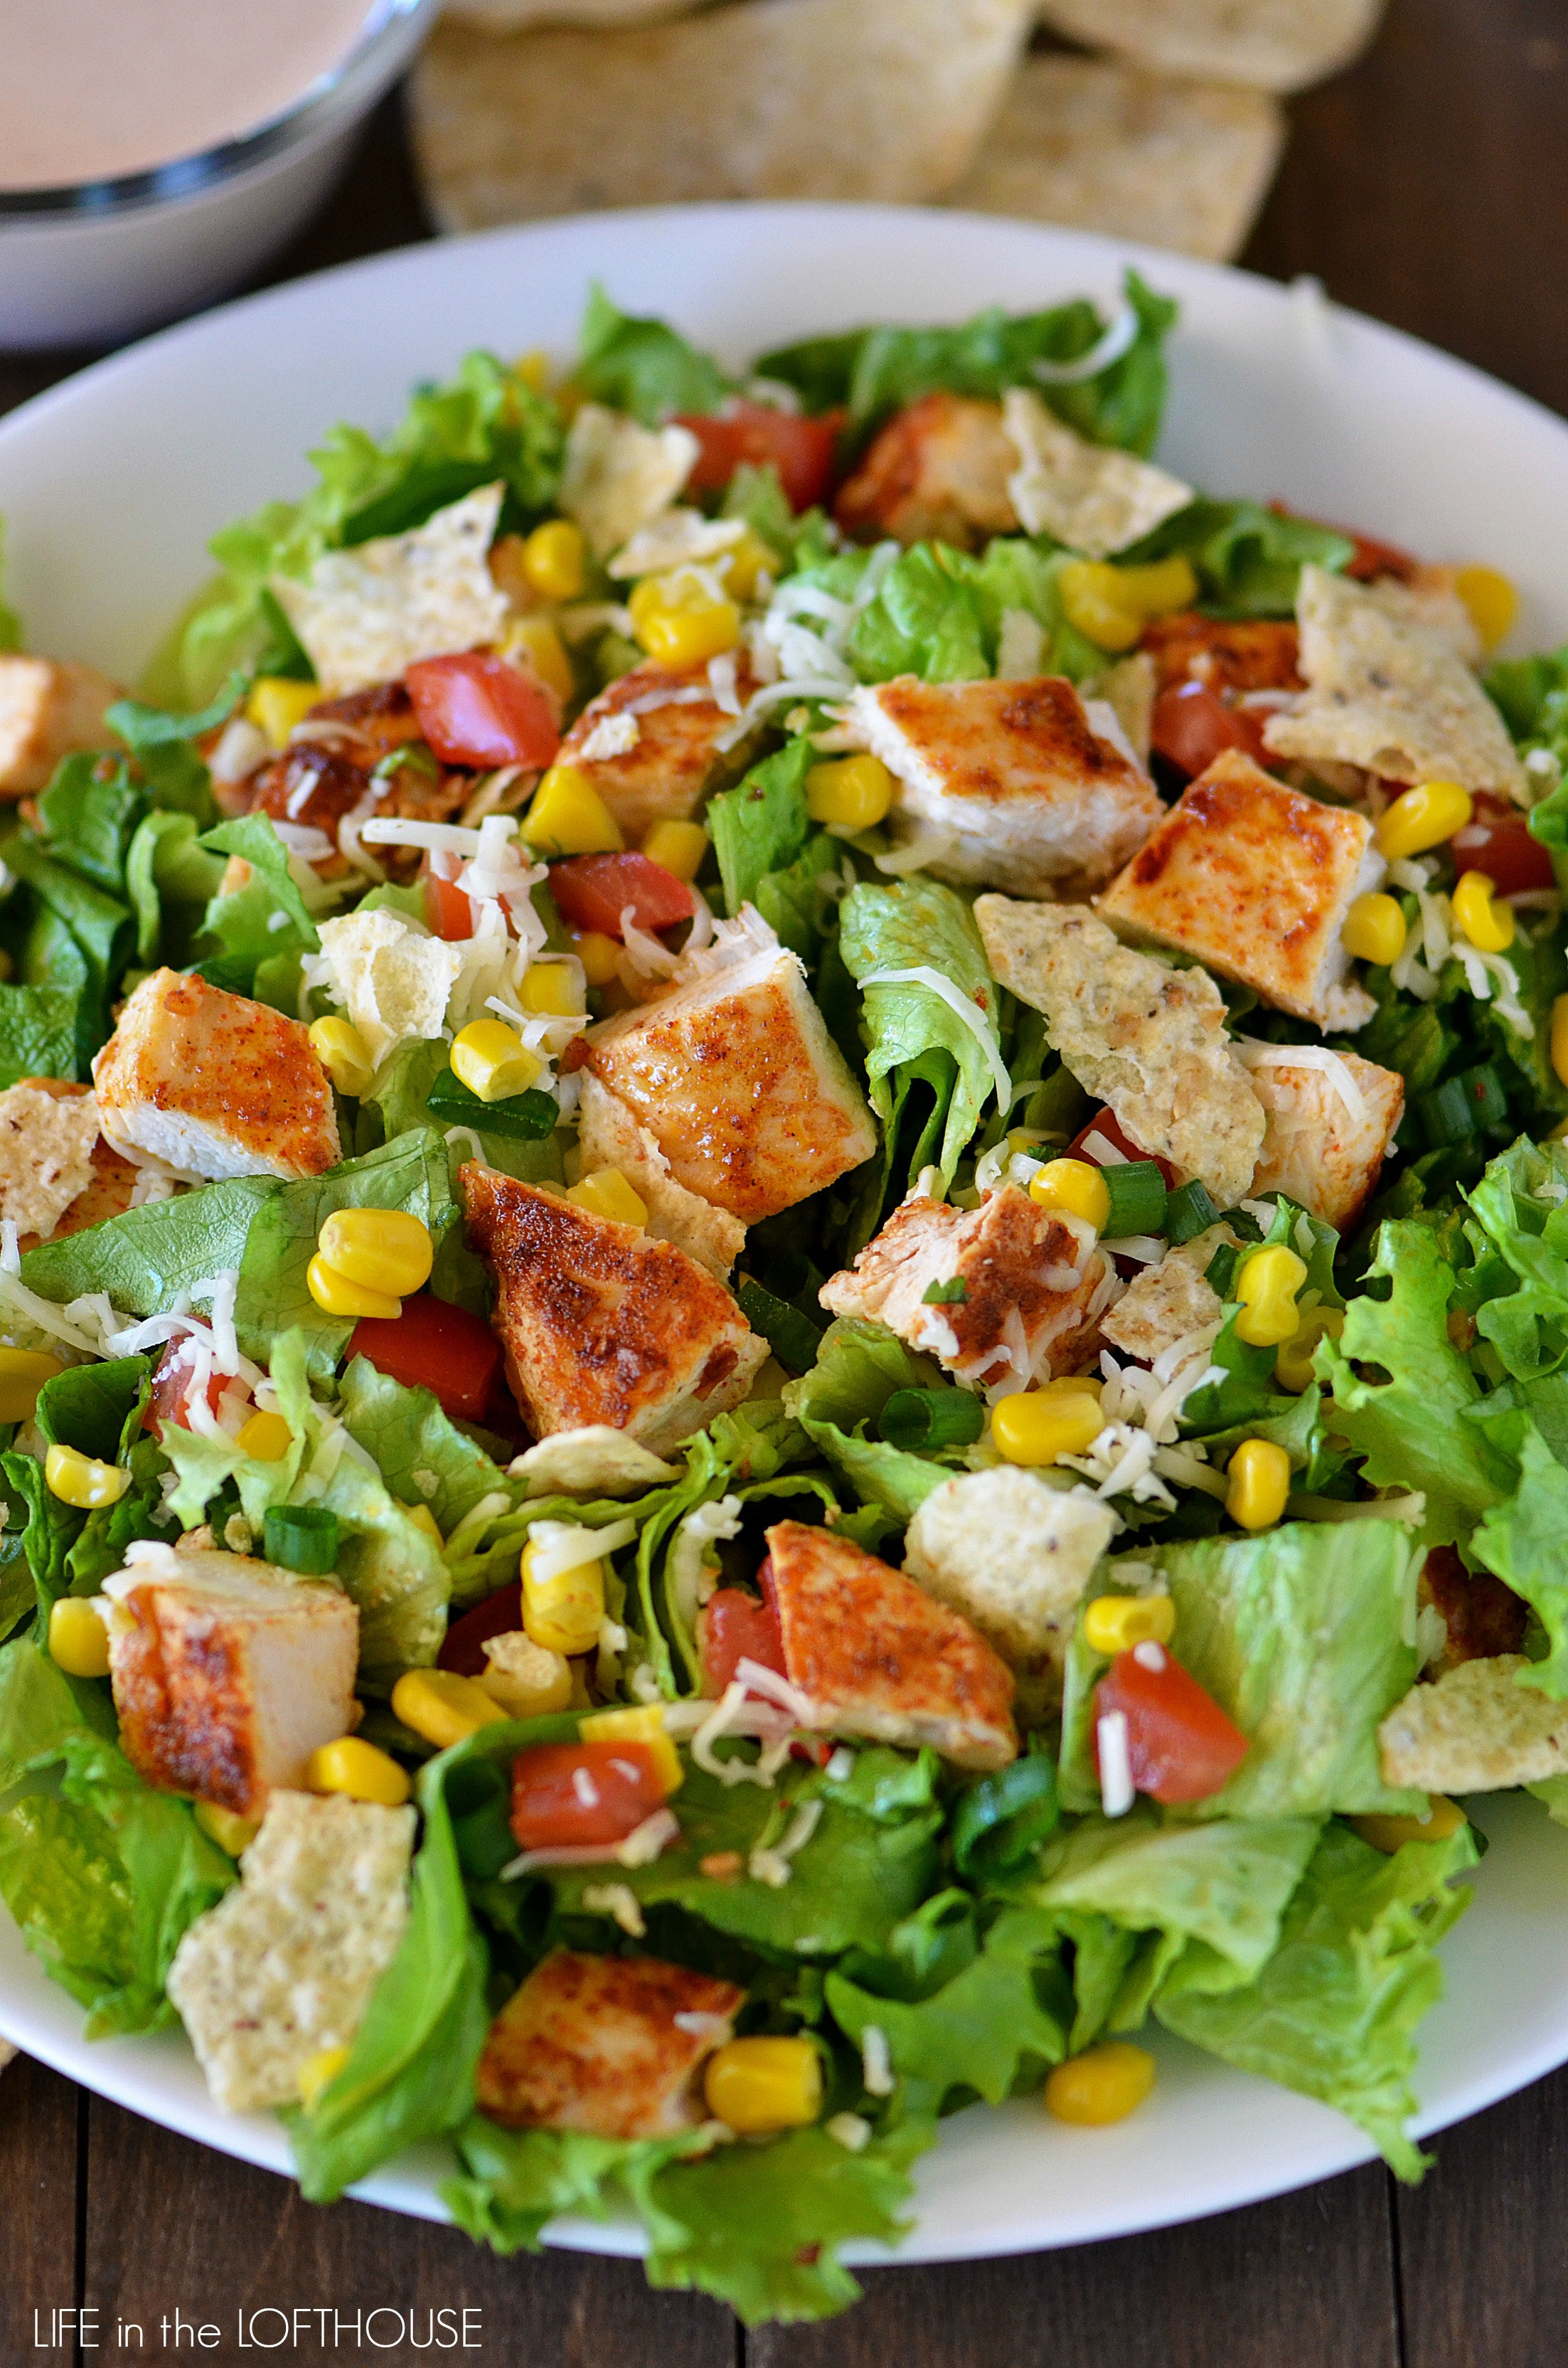 Chicken Salad Healthy  Chicken Taco Salad Life In The Lofthouse